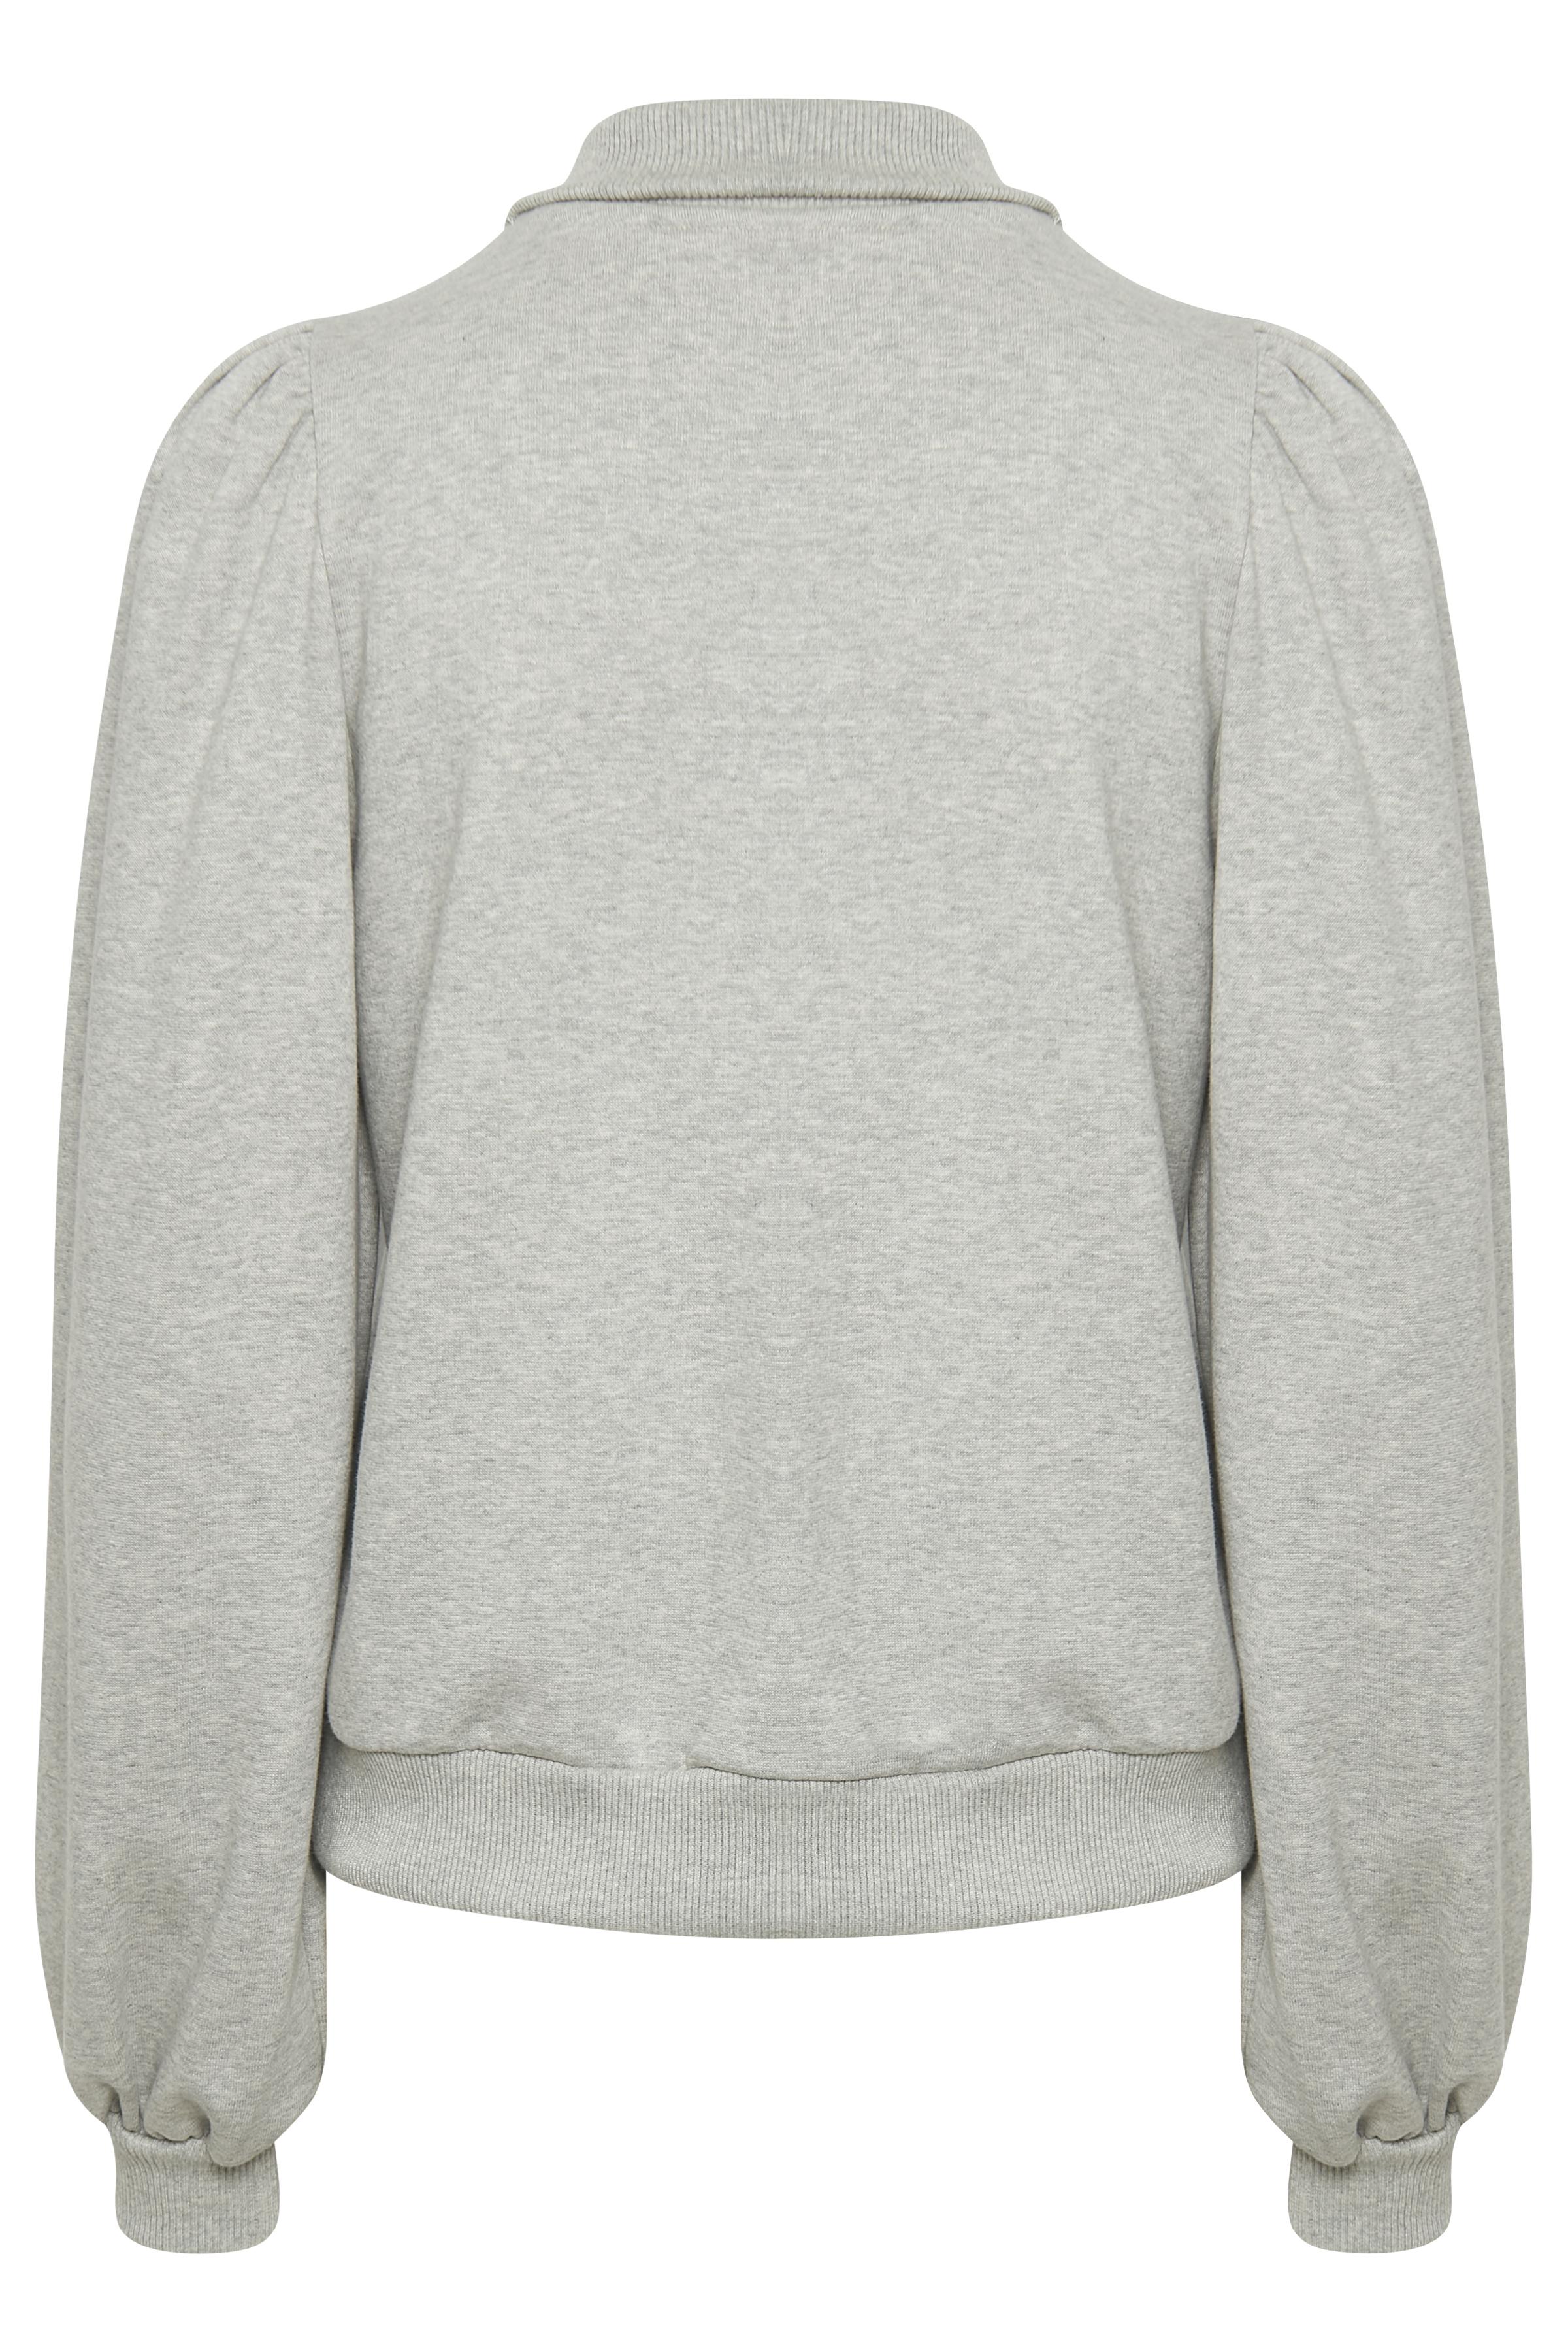 Gestuz NankitaGZ sweatshirt, Light Grey Melange, L